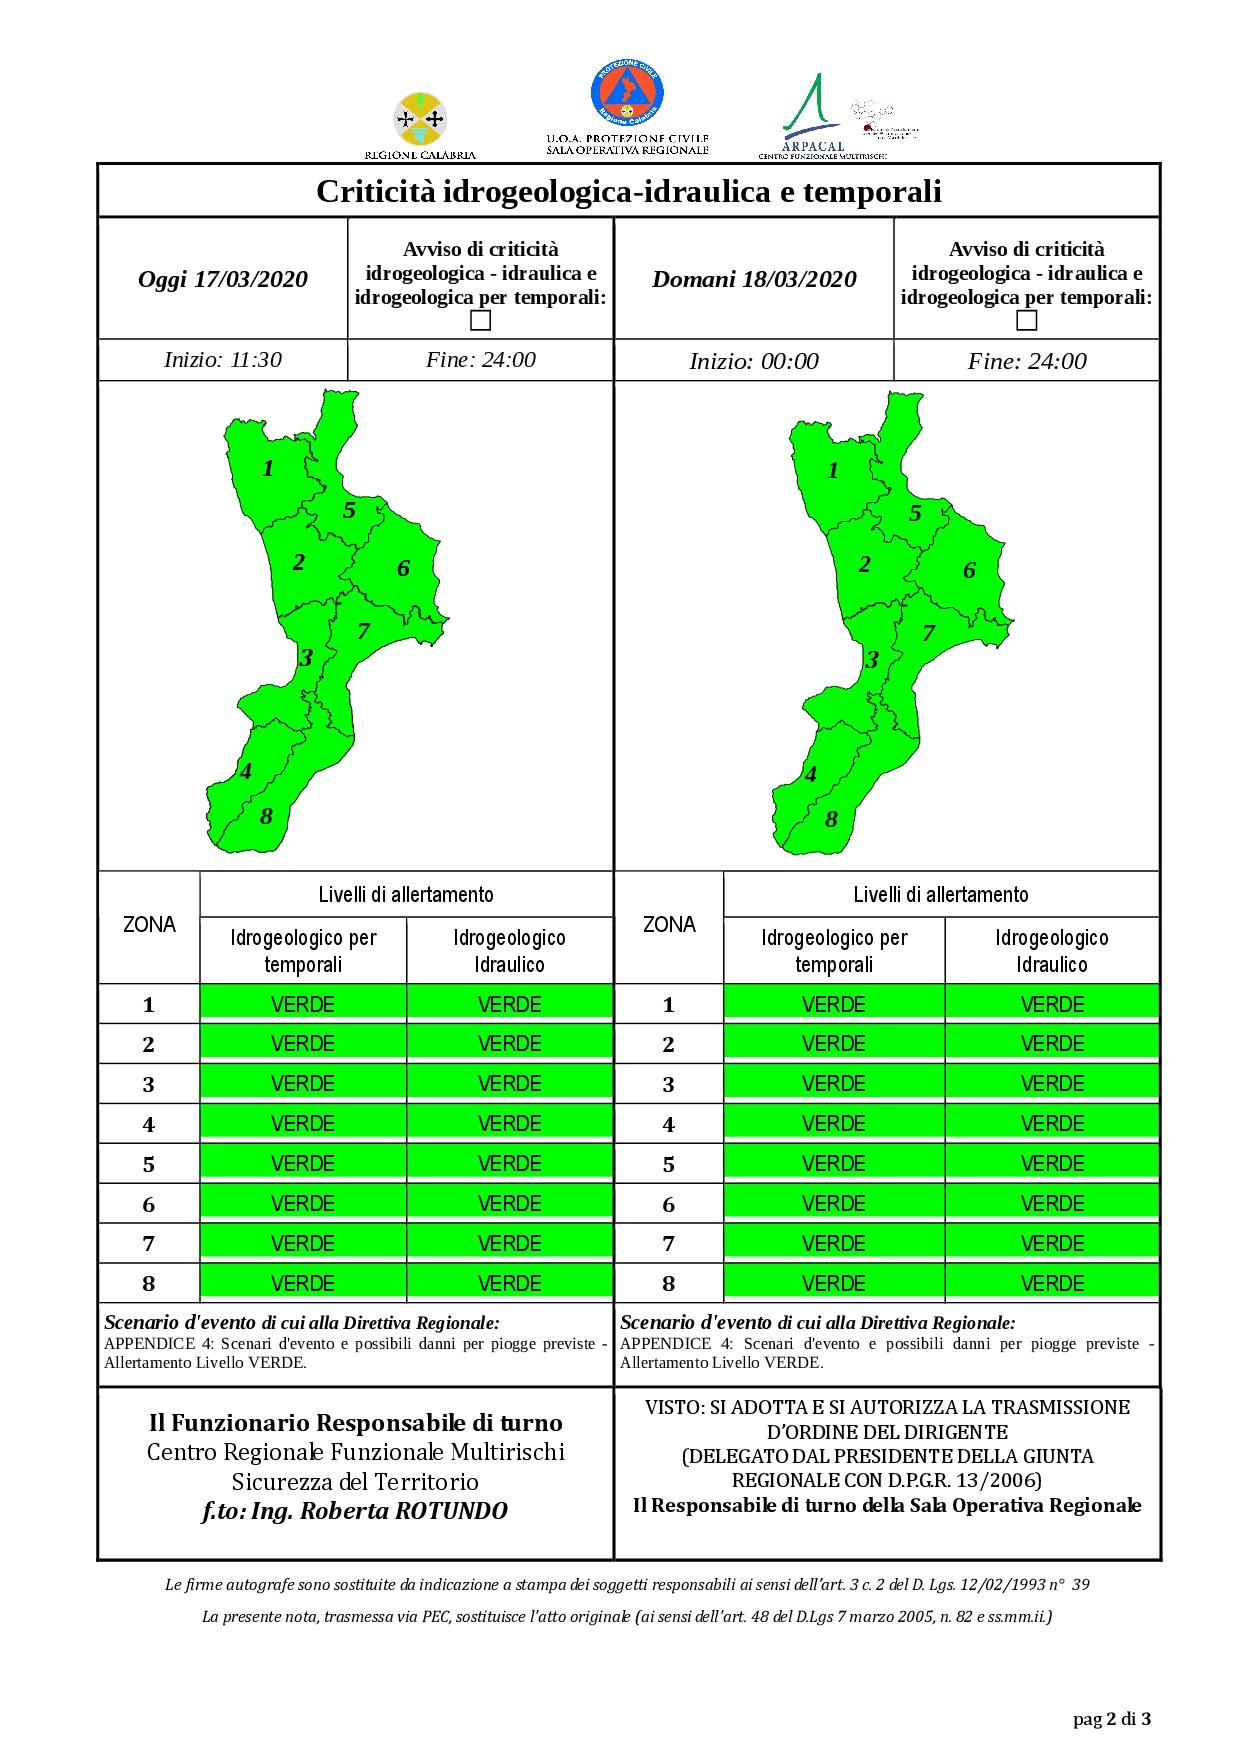 Criticità idrogeologica-idraulica e temporali in Calabria 17-03-2020